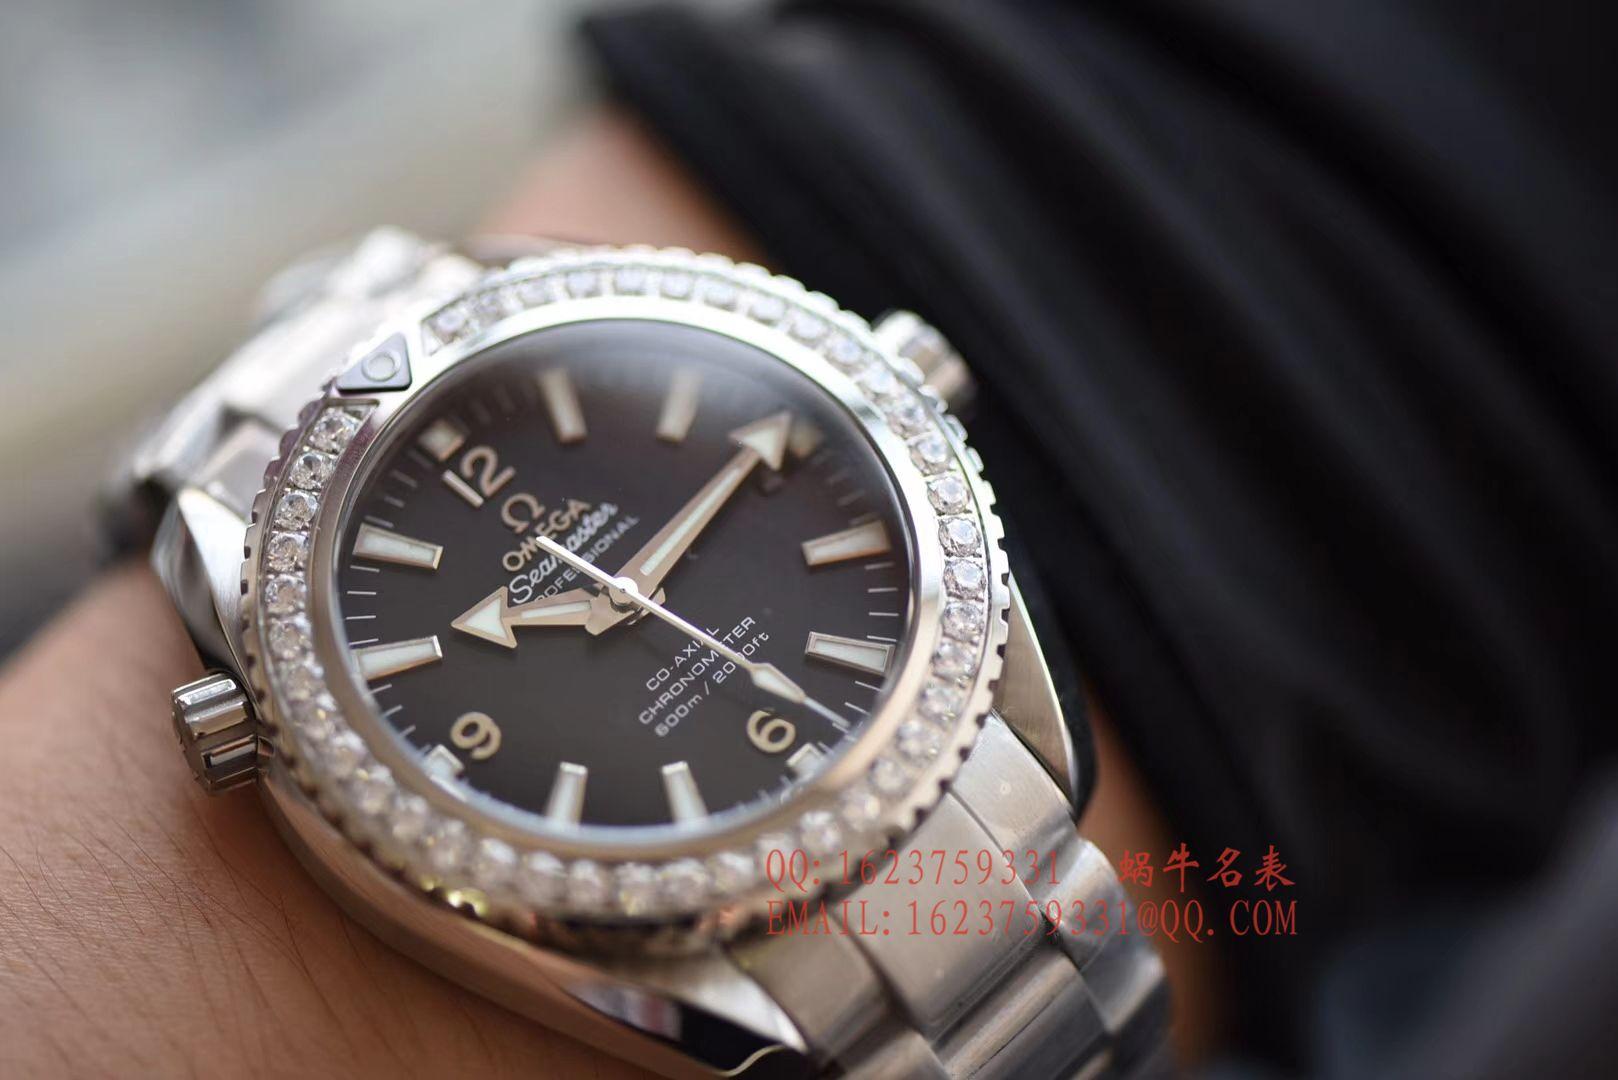 【KW一比一超A高仿手表】欧米茄海马海洋宇宙600米系列232.15.42.21.01.001腕表 / MB0138